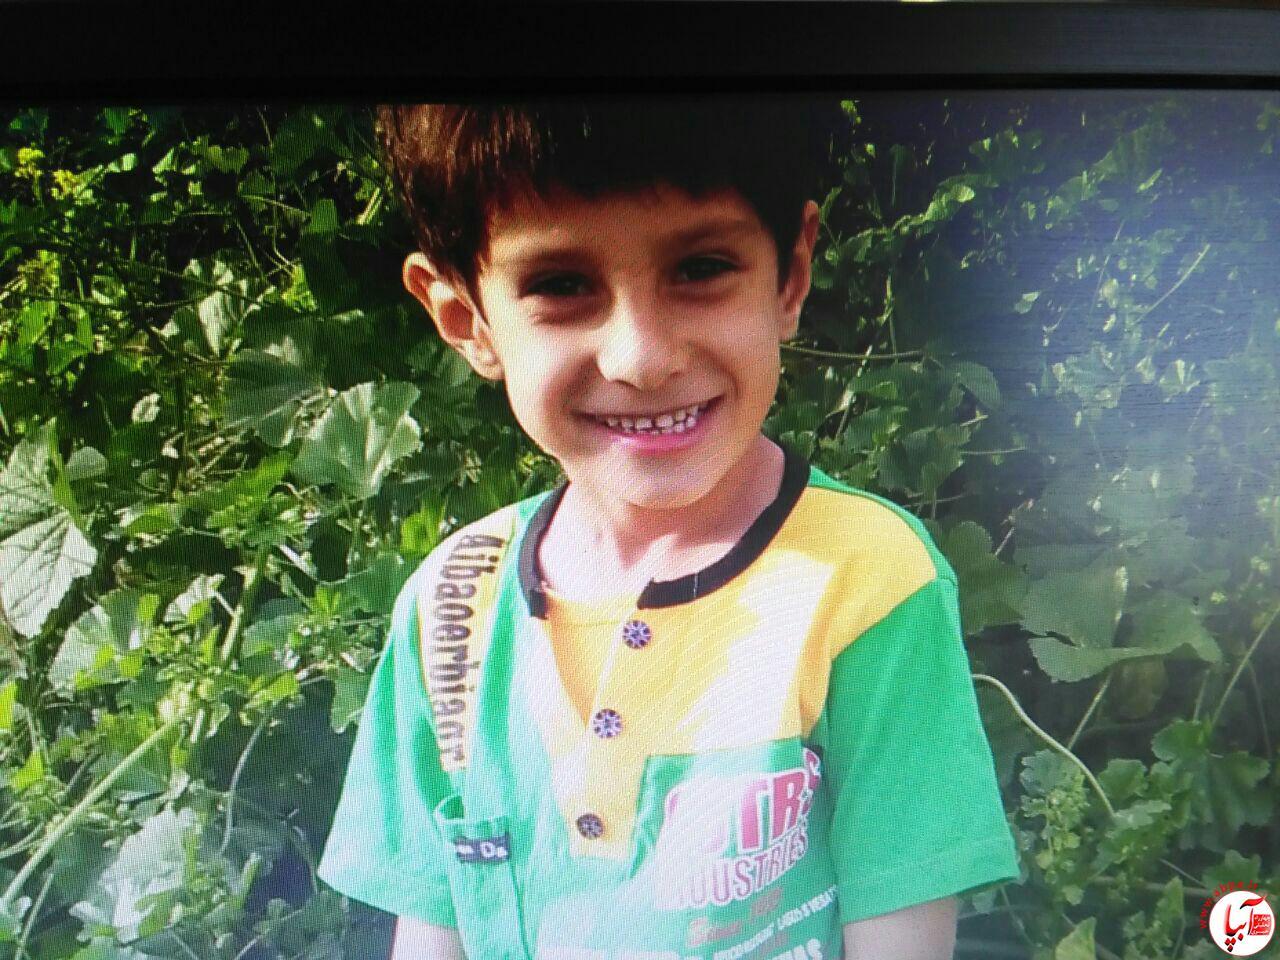 کیارش شمشیری 6 ساله شیراز